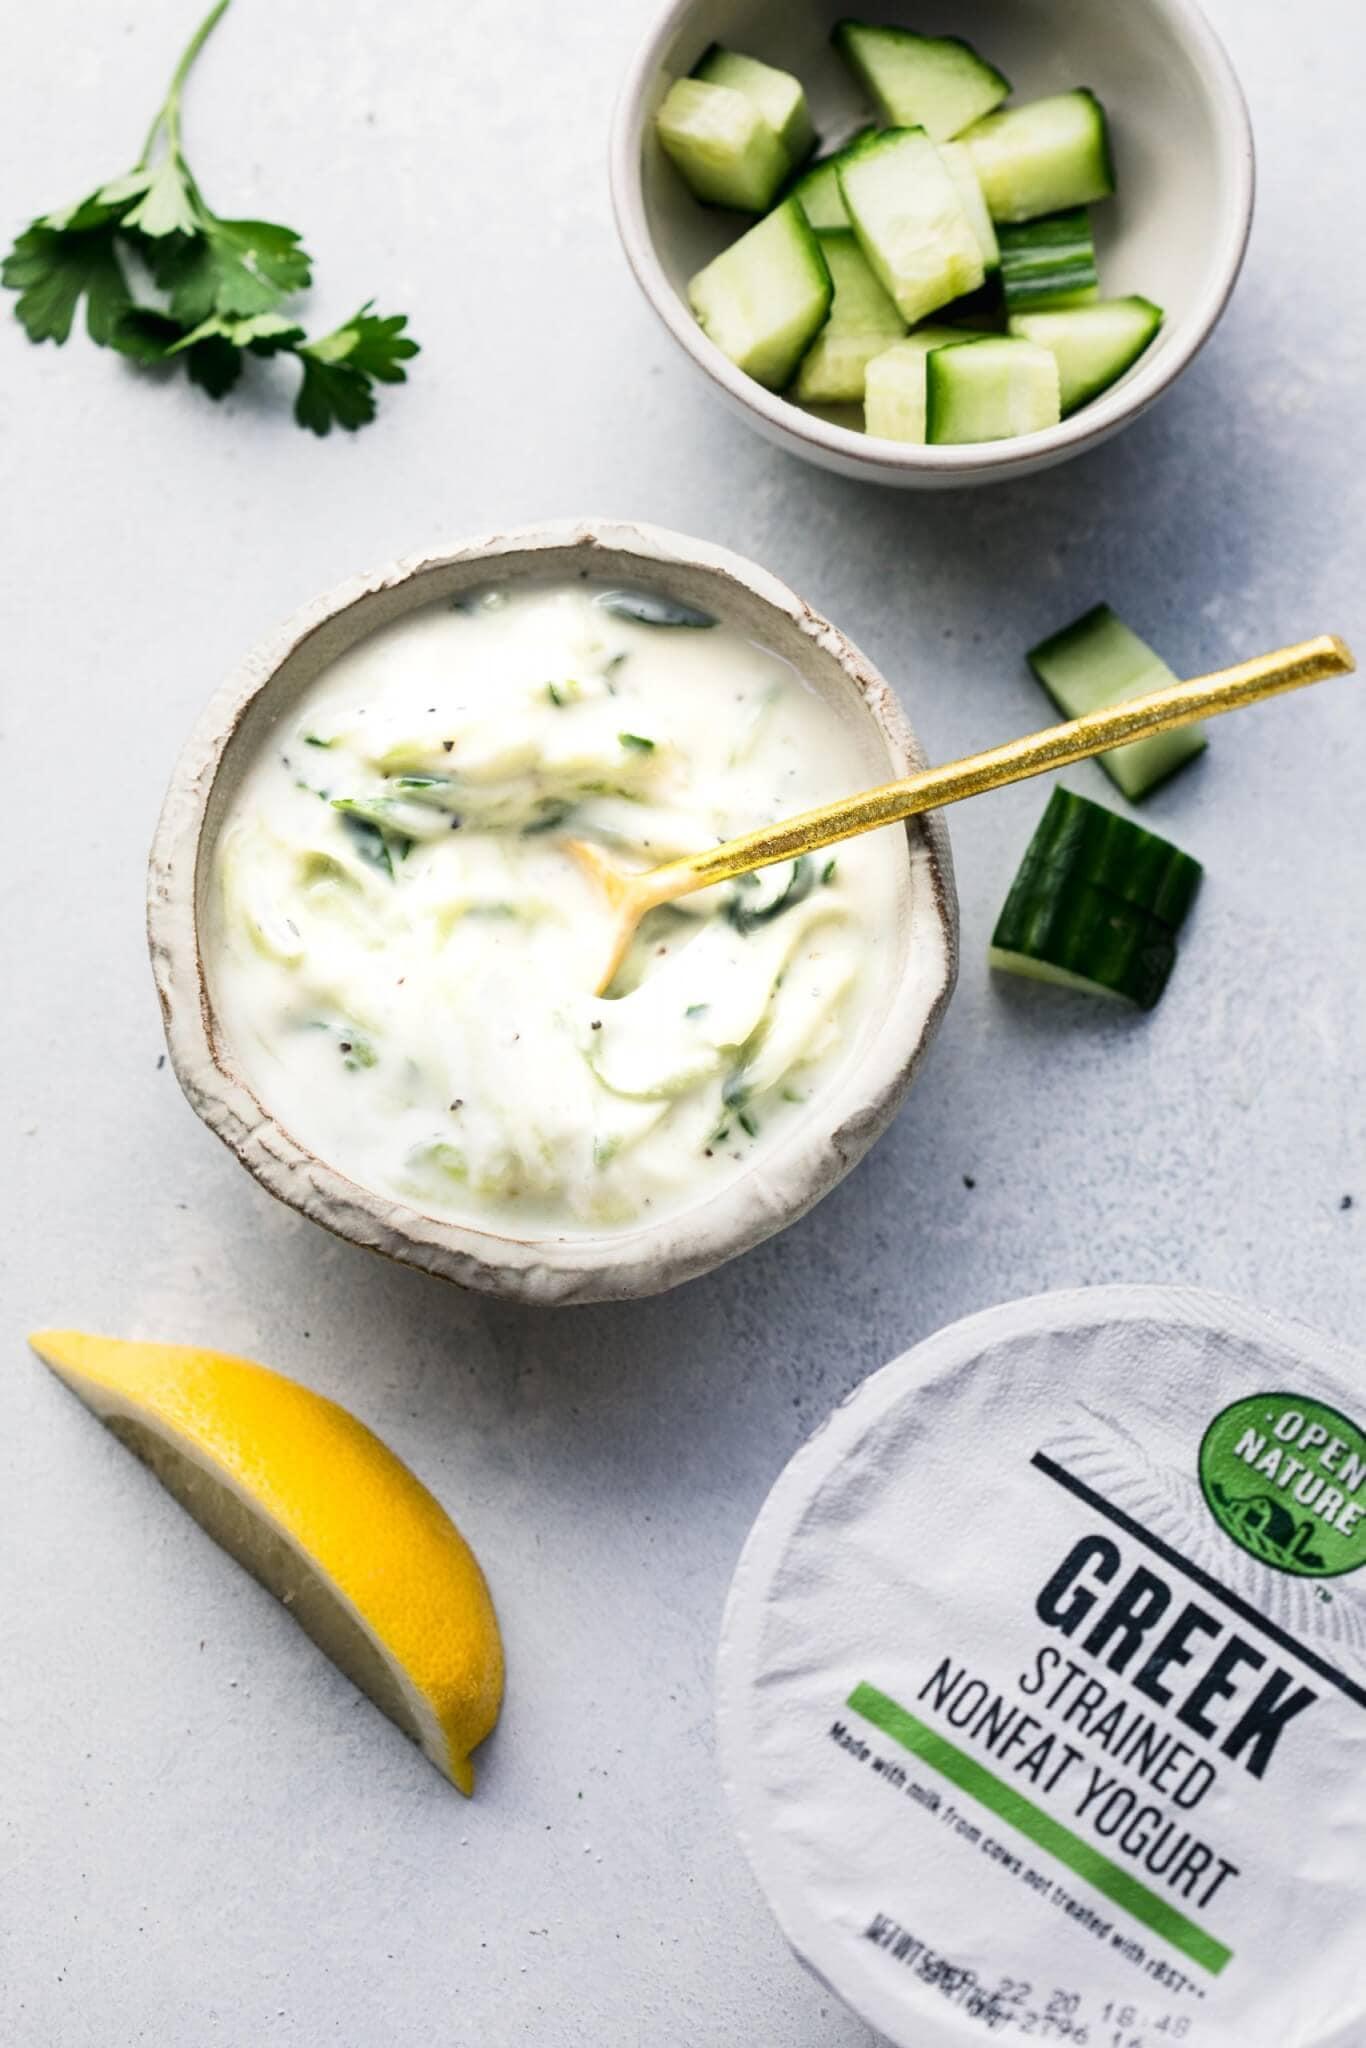 Container of greek yogurt next to small bowl of prepared tzatziki sauce